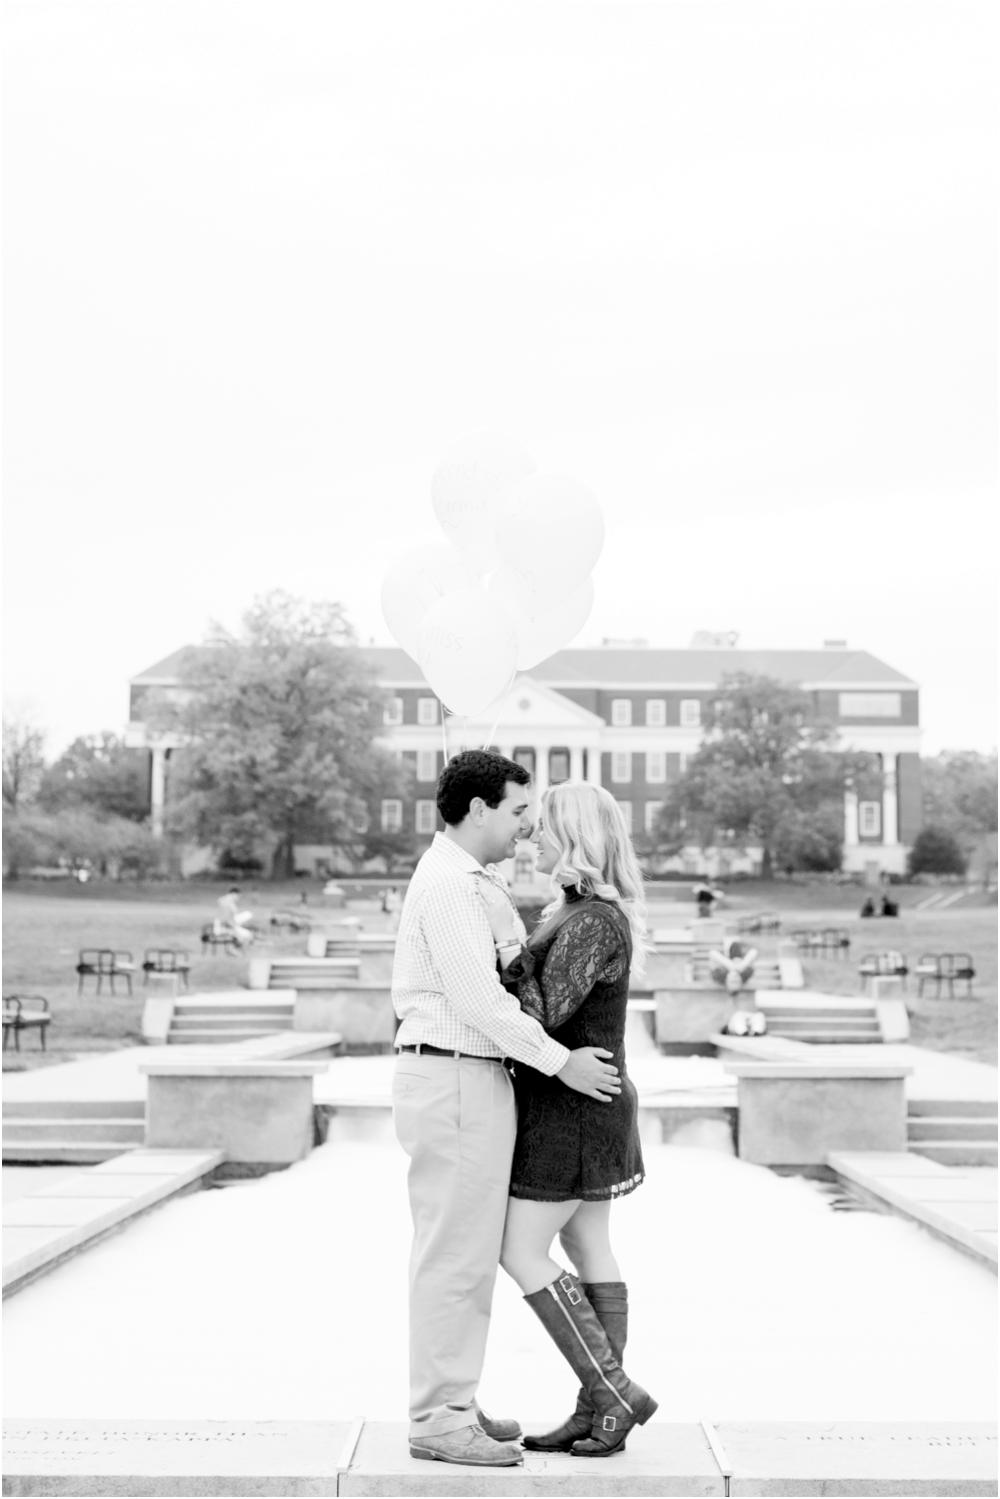 torie chris university of maryland engagement session living radiant photography_0024.jpg